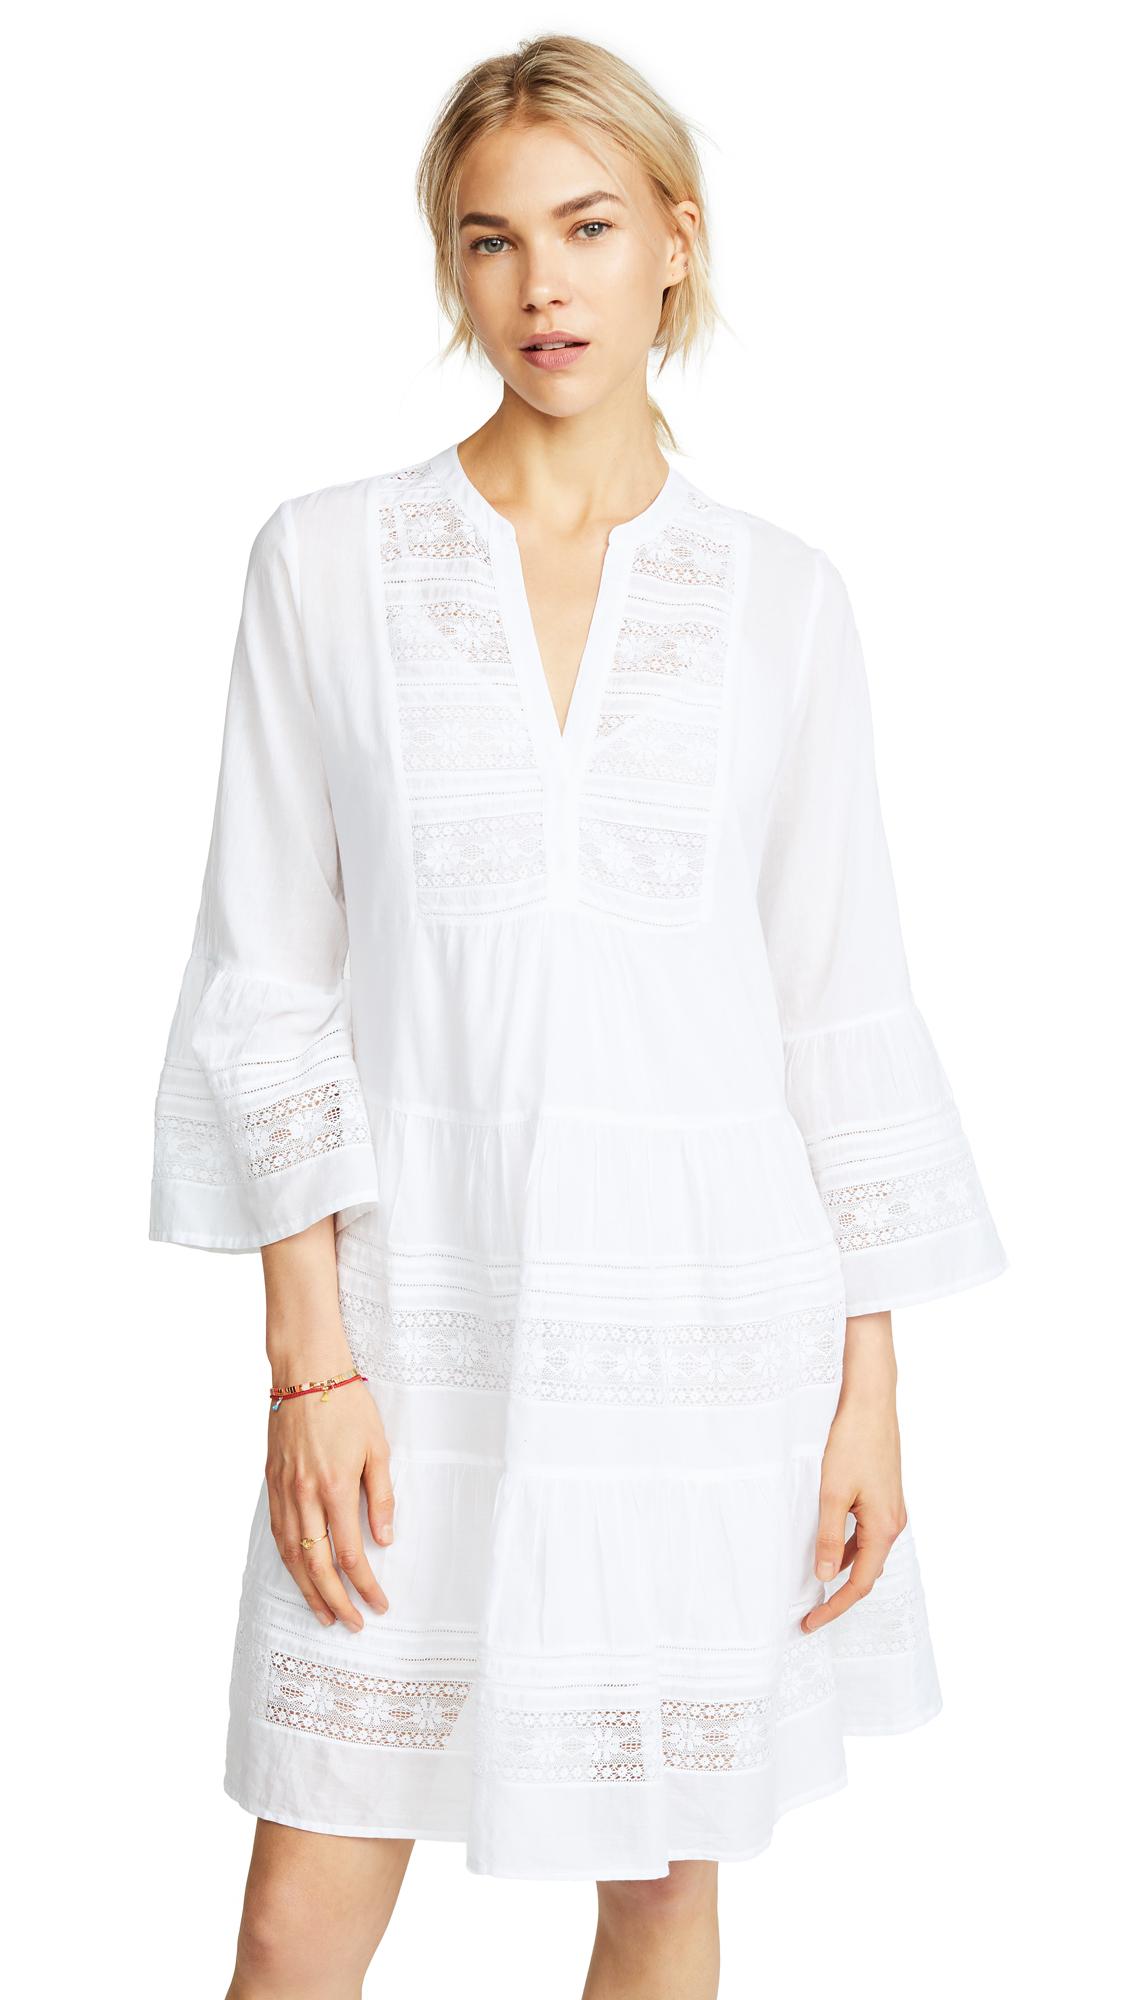 Velvet Nuria Lace Dress